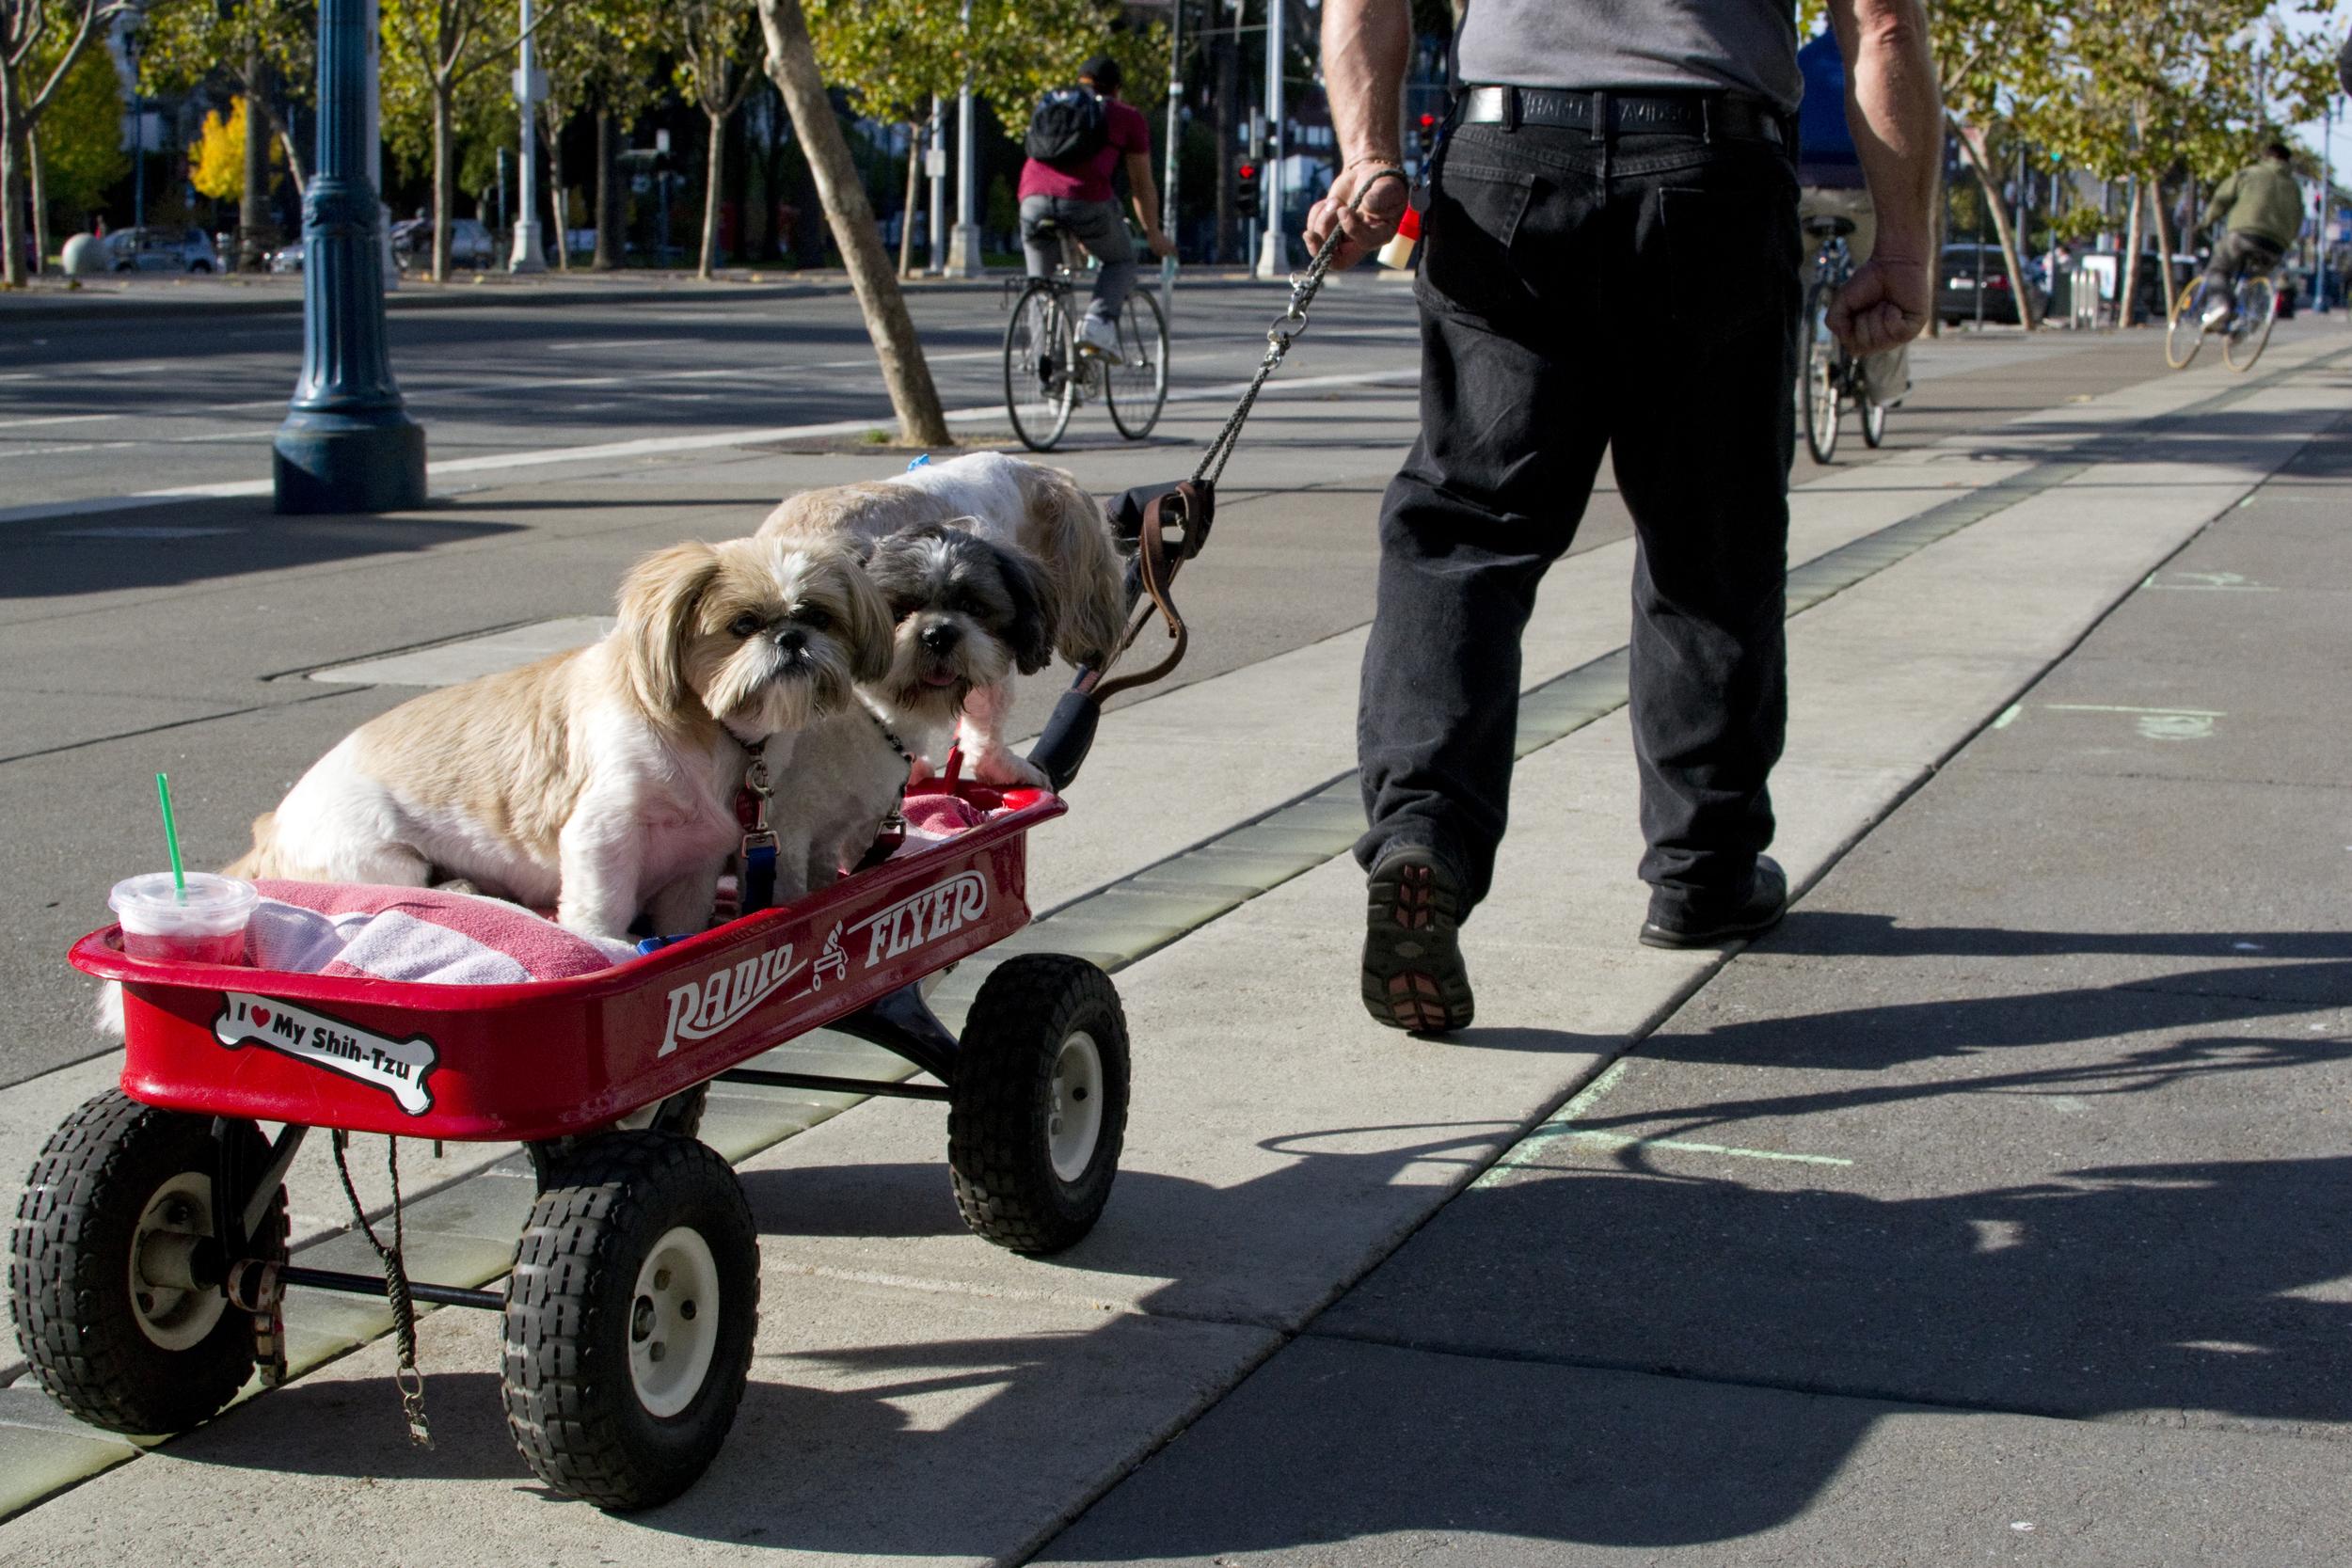 A man pulls three shih tzus in a wagon along the Embarcadero in San Francisco, Calif.Wednesday, Nov. 21, 2012.